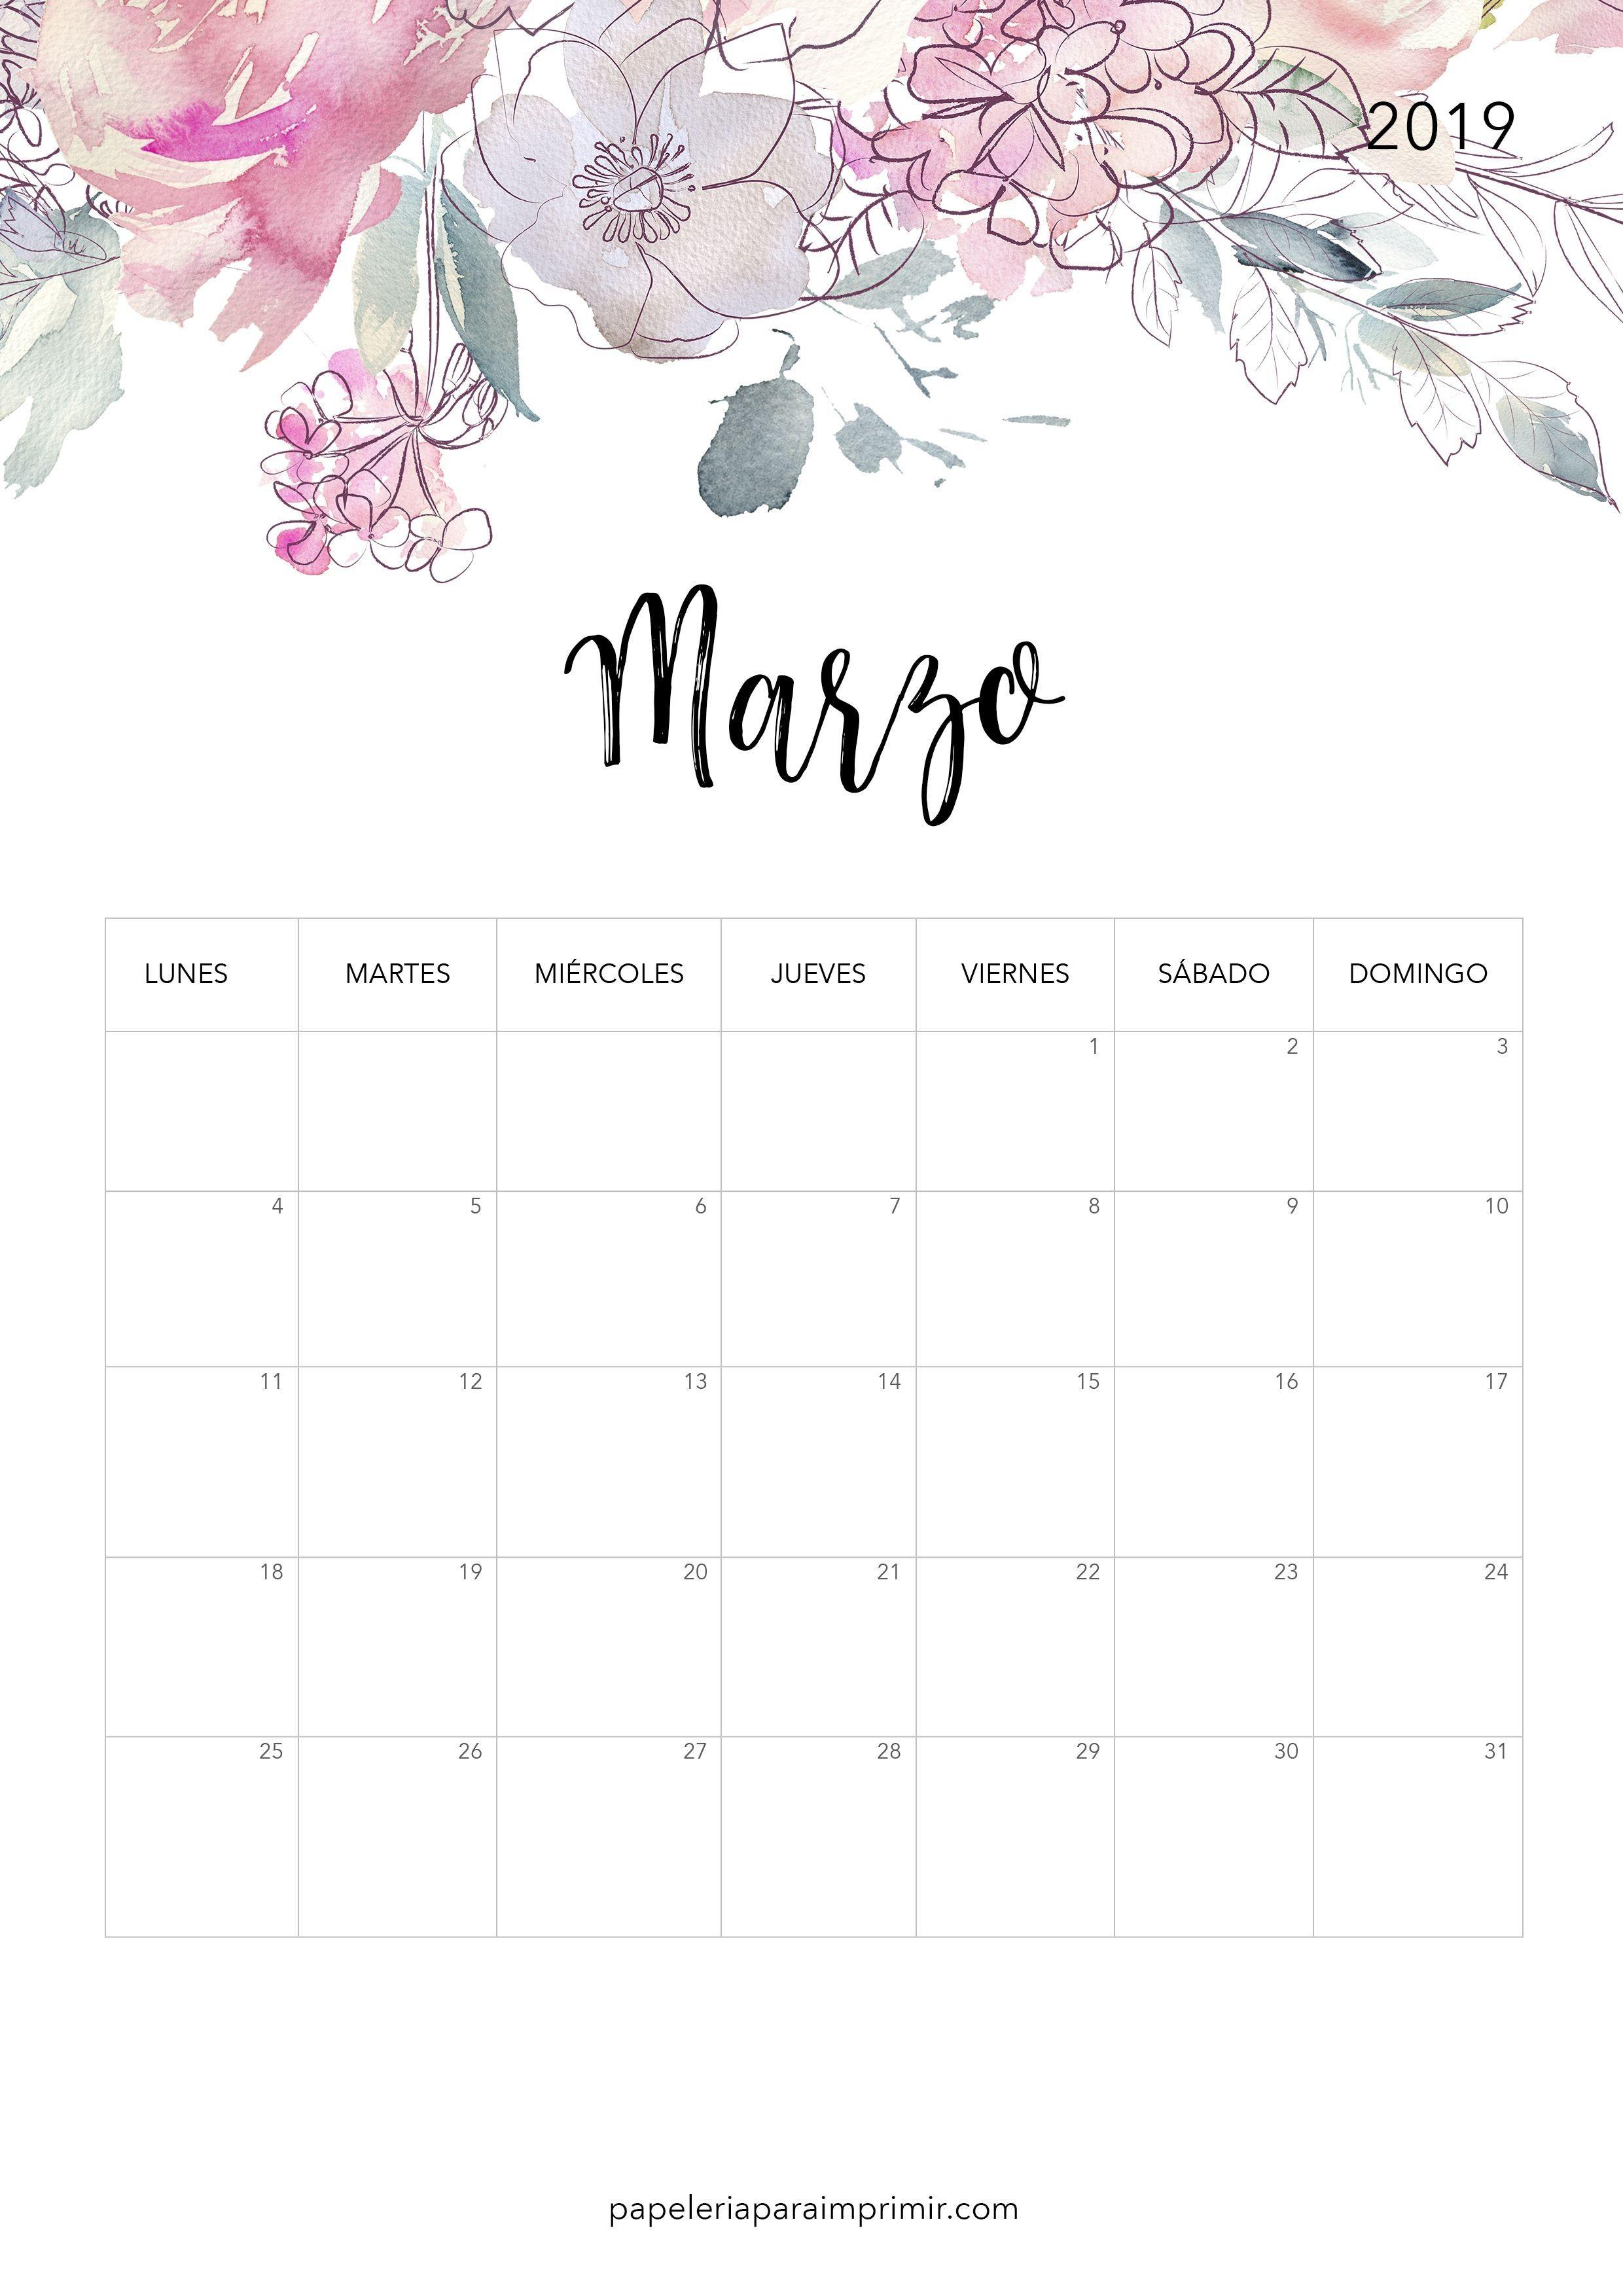 Calendario Dezembro 2019 Bonito.Es Calendario 2019 Bonito Pdf Calendario 2019 บ นท ก